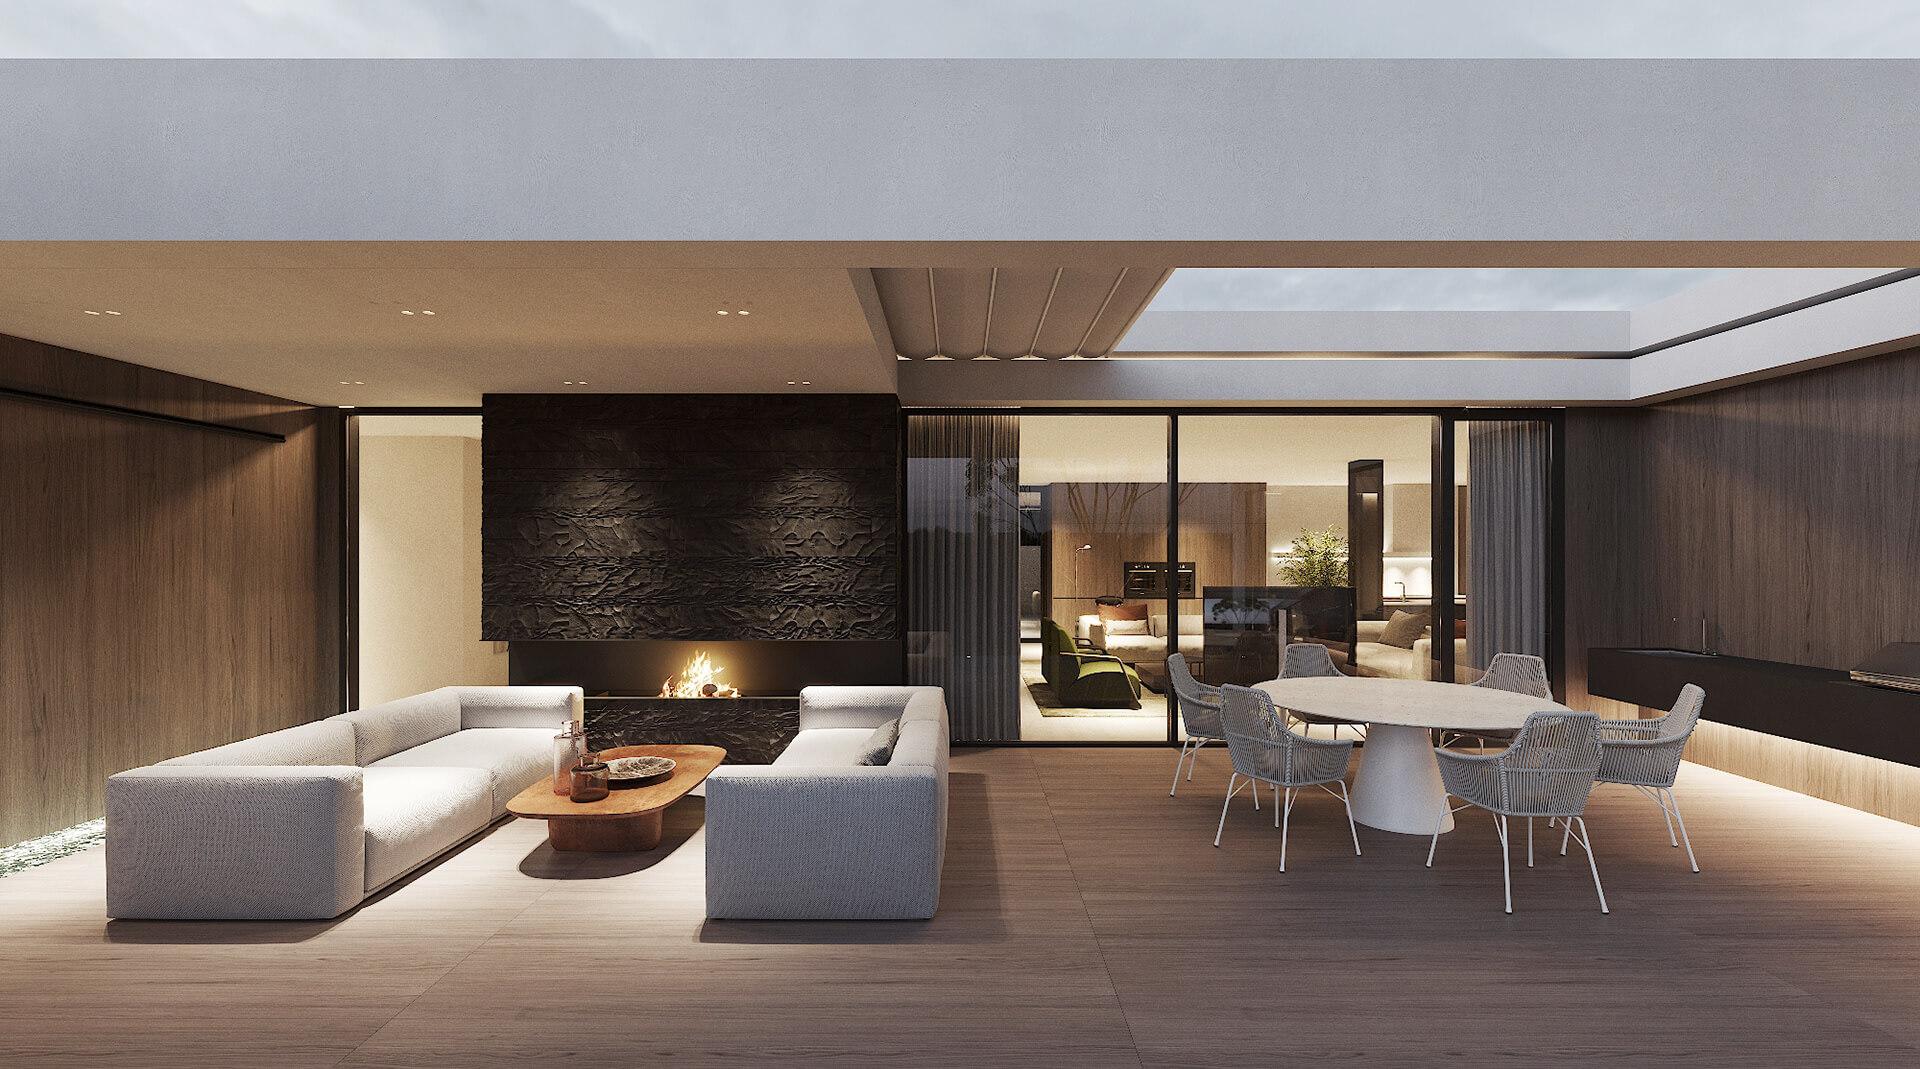 Interior design in Costa Mesa, CA